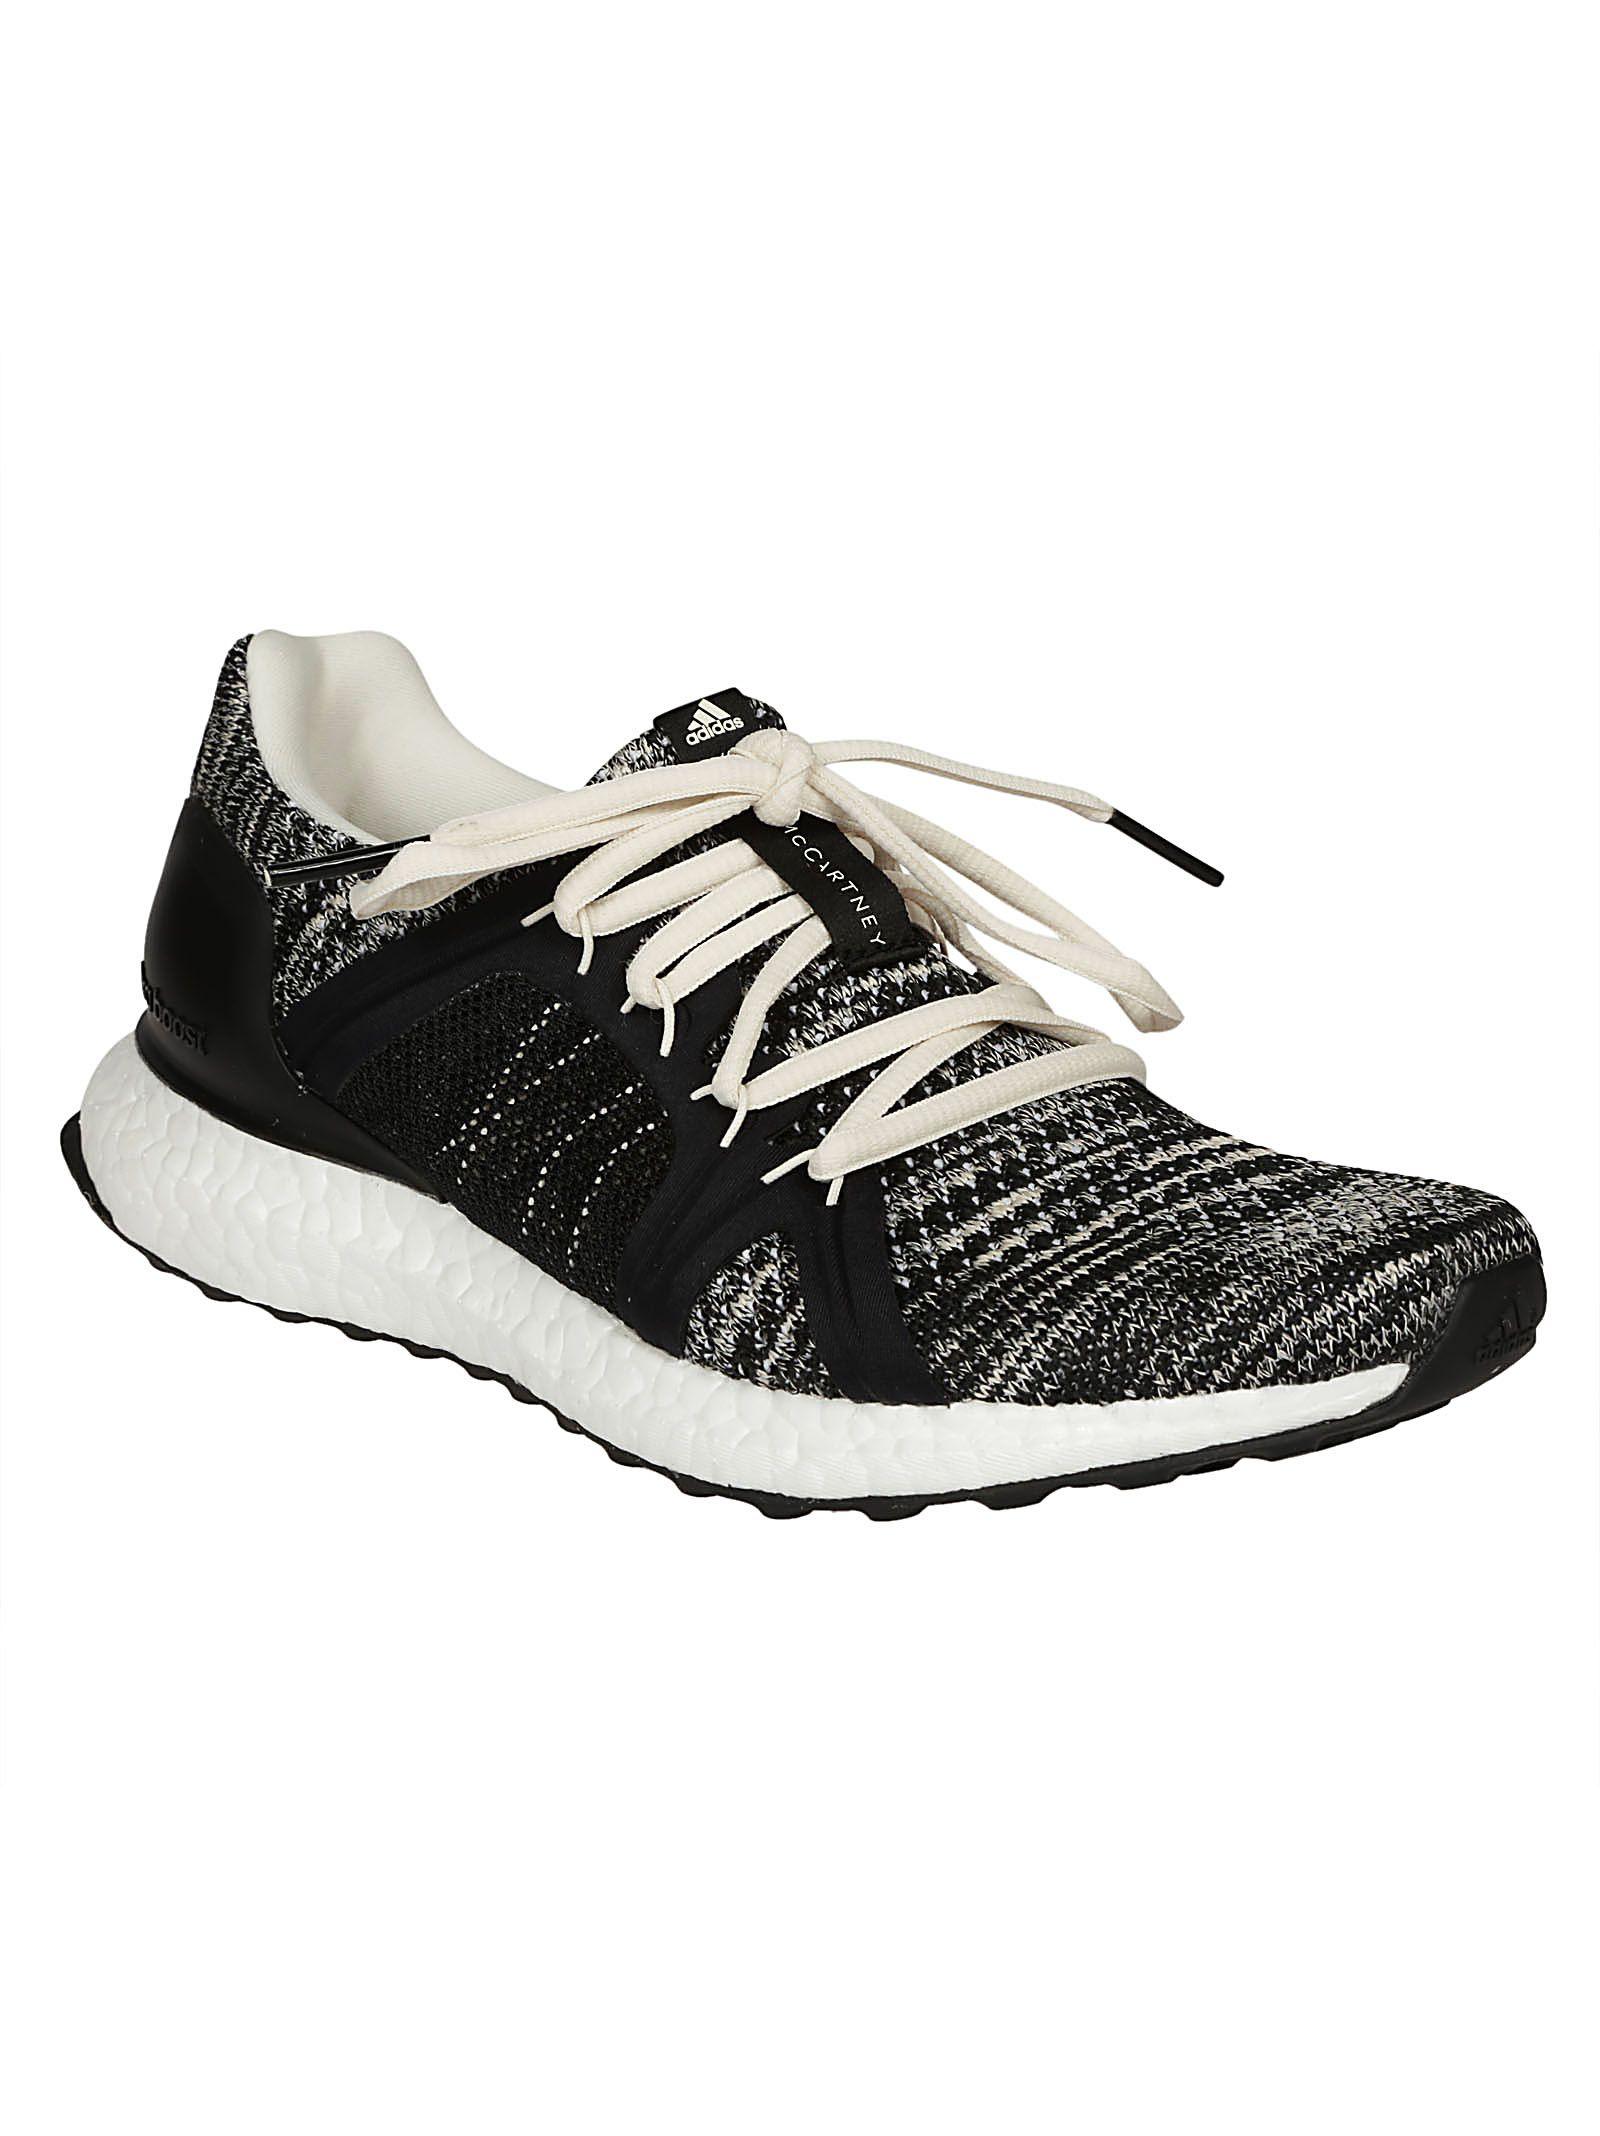 203720db4b85c ... Stella McCartney Adidas By Stella Mccartney Ultraboost Parley Sneakers  - Black white ...